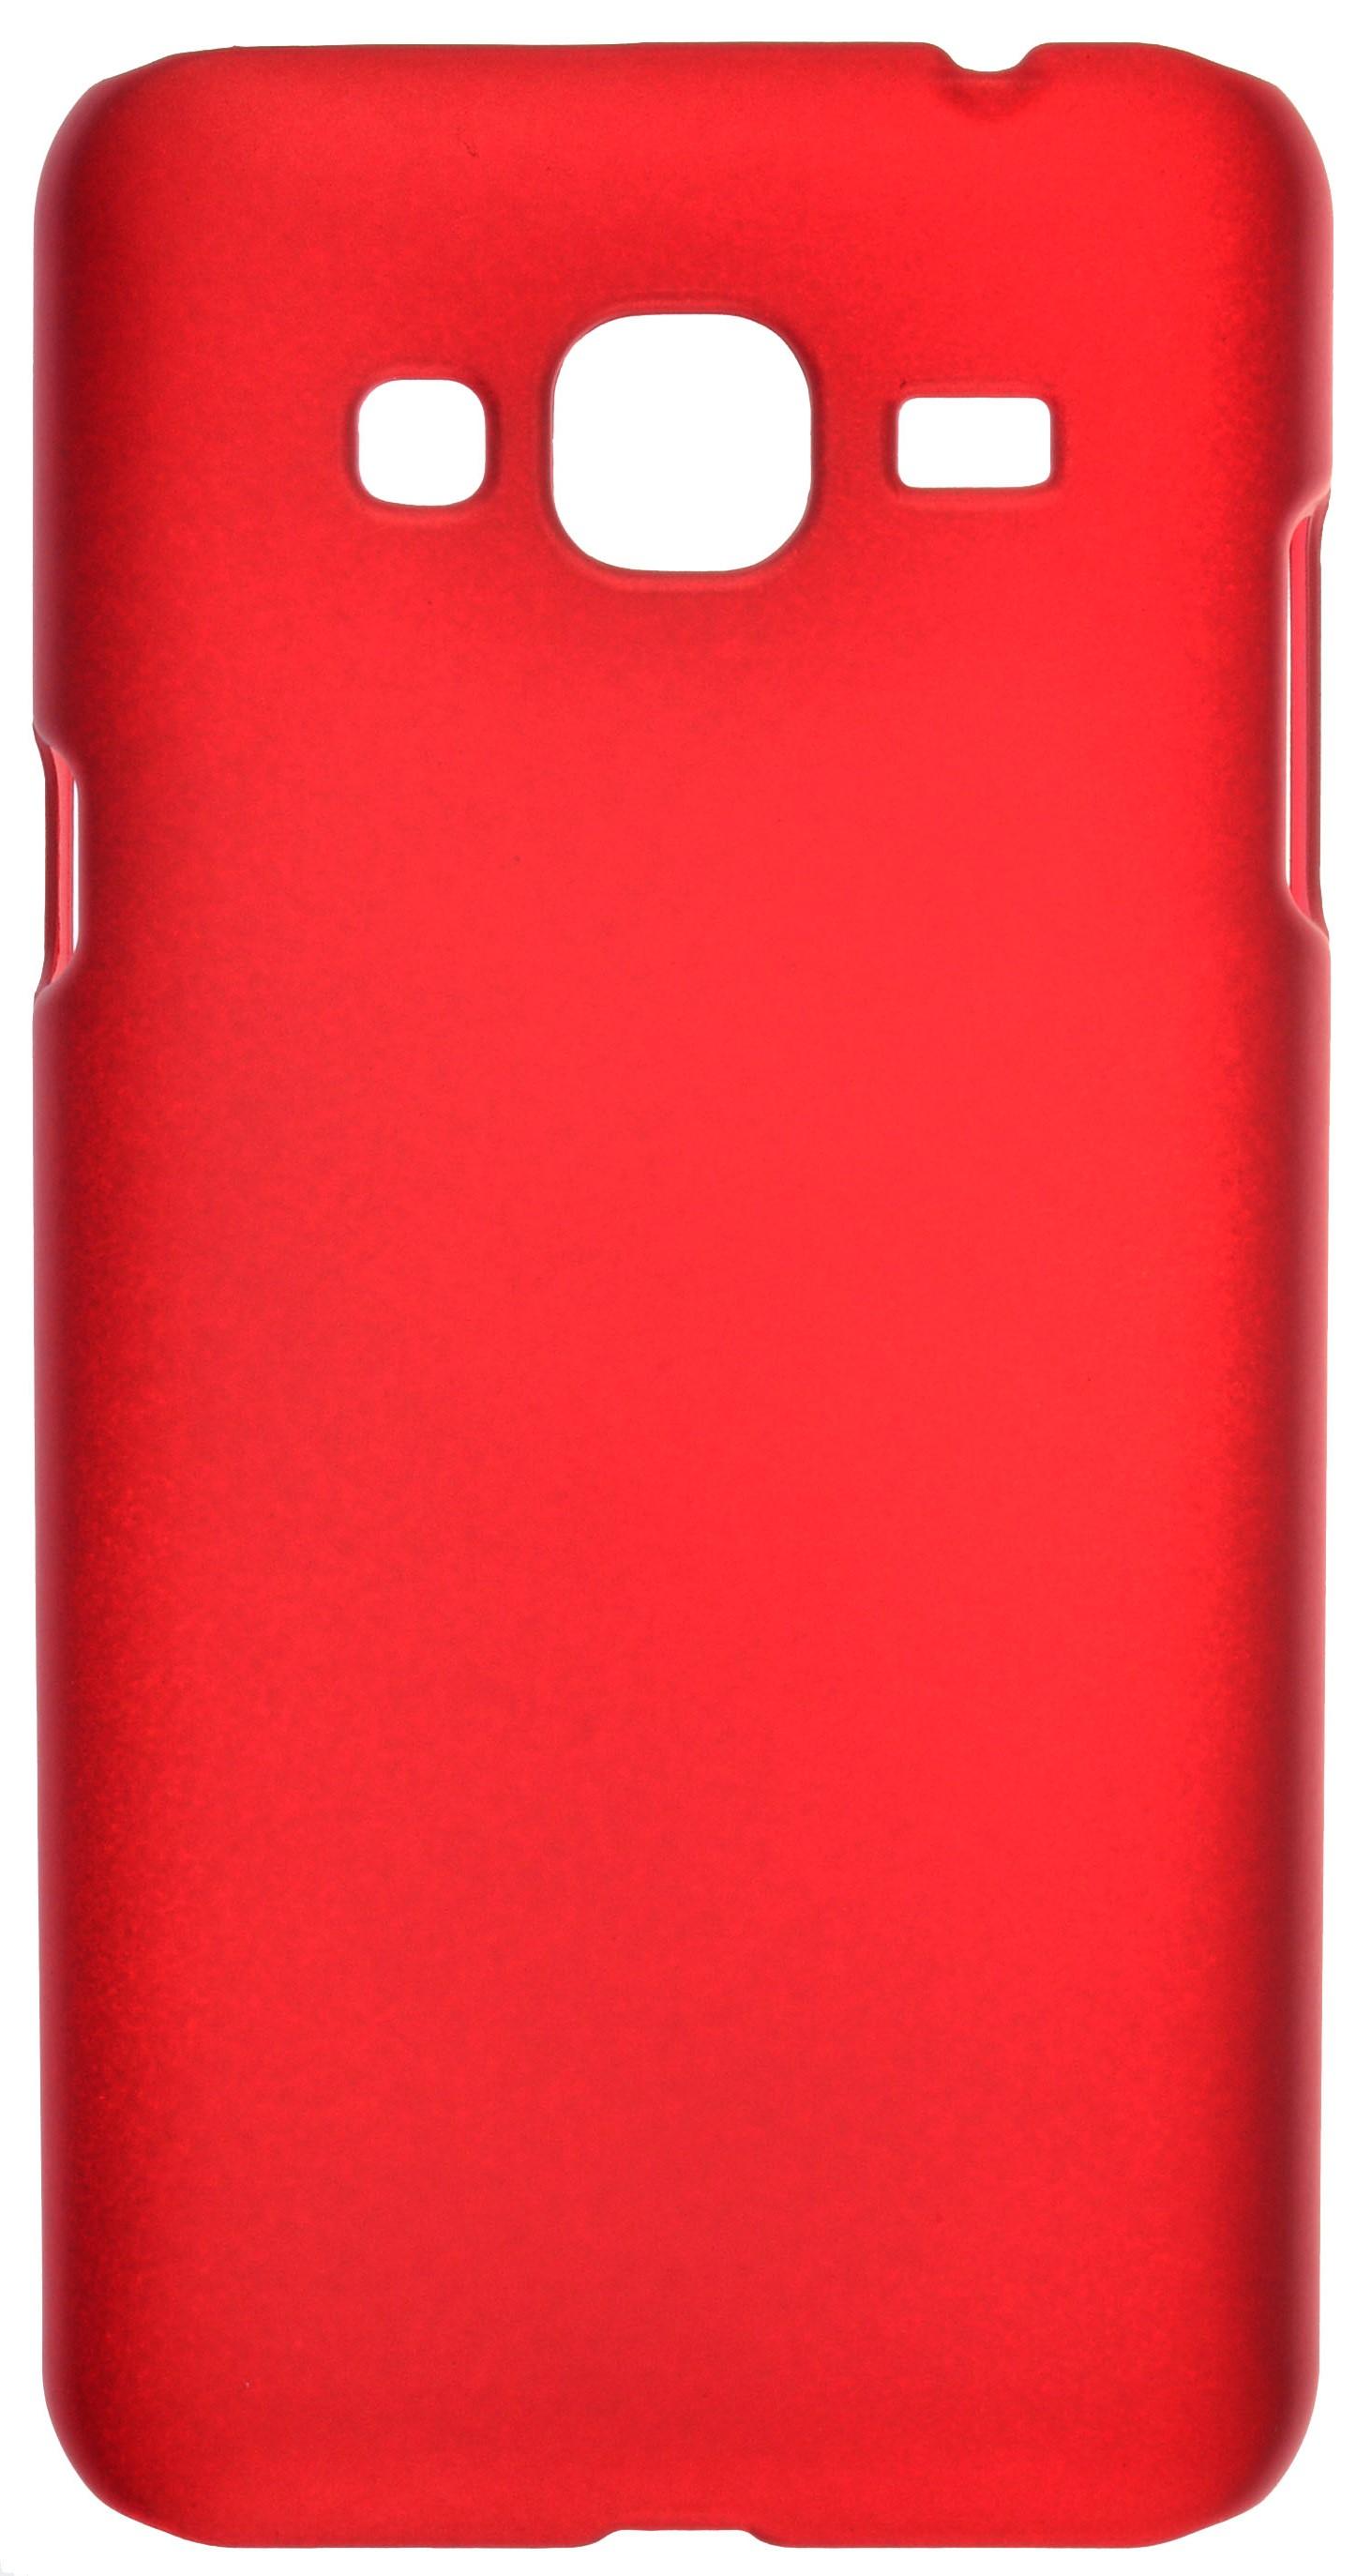 Чехол skinBOX 4People case для Samsung Galaxy J3 (2016) SM-J320F, красный